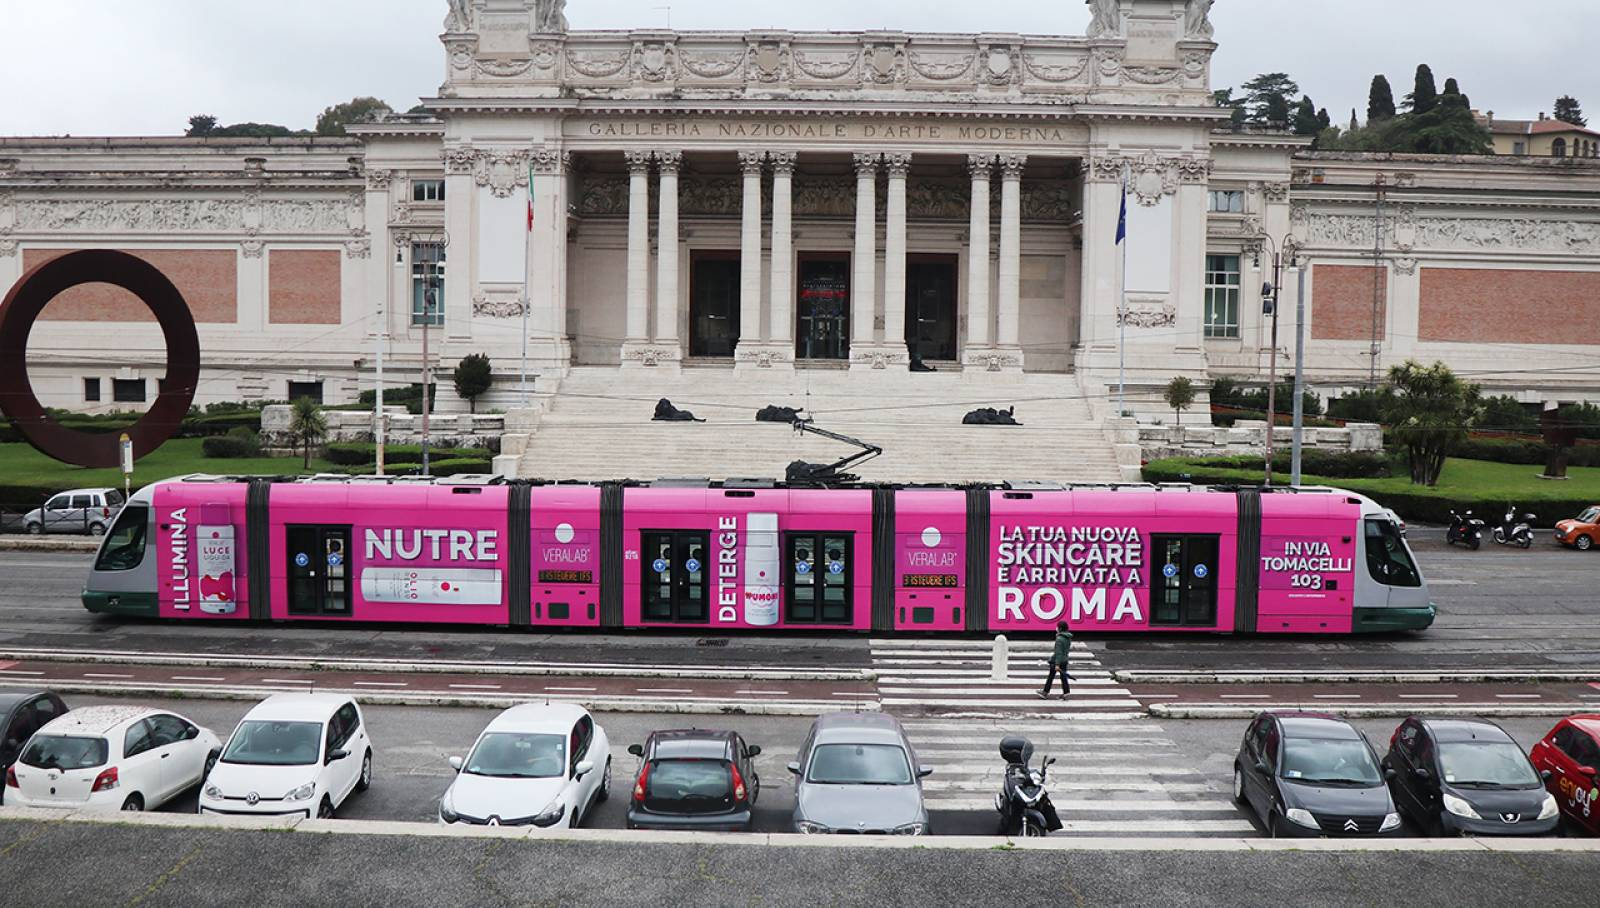 Pubblicità OOH a Roma Full-Wrap IGPDecaux per L'Estetista Cinica